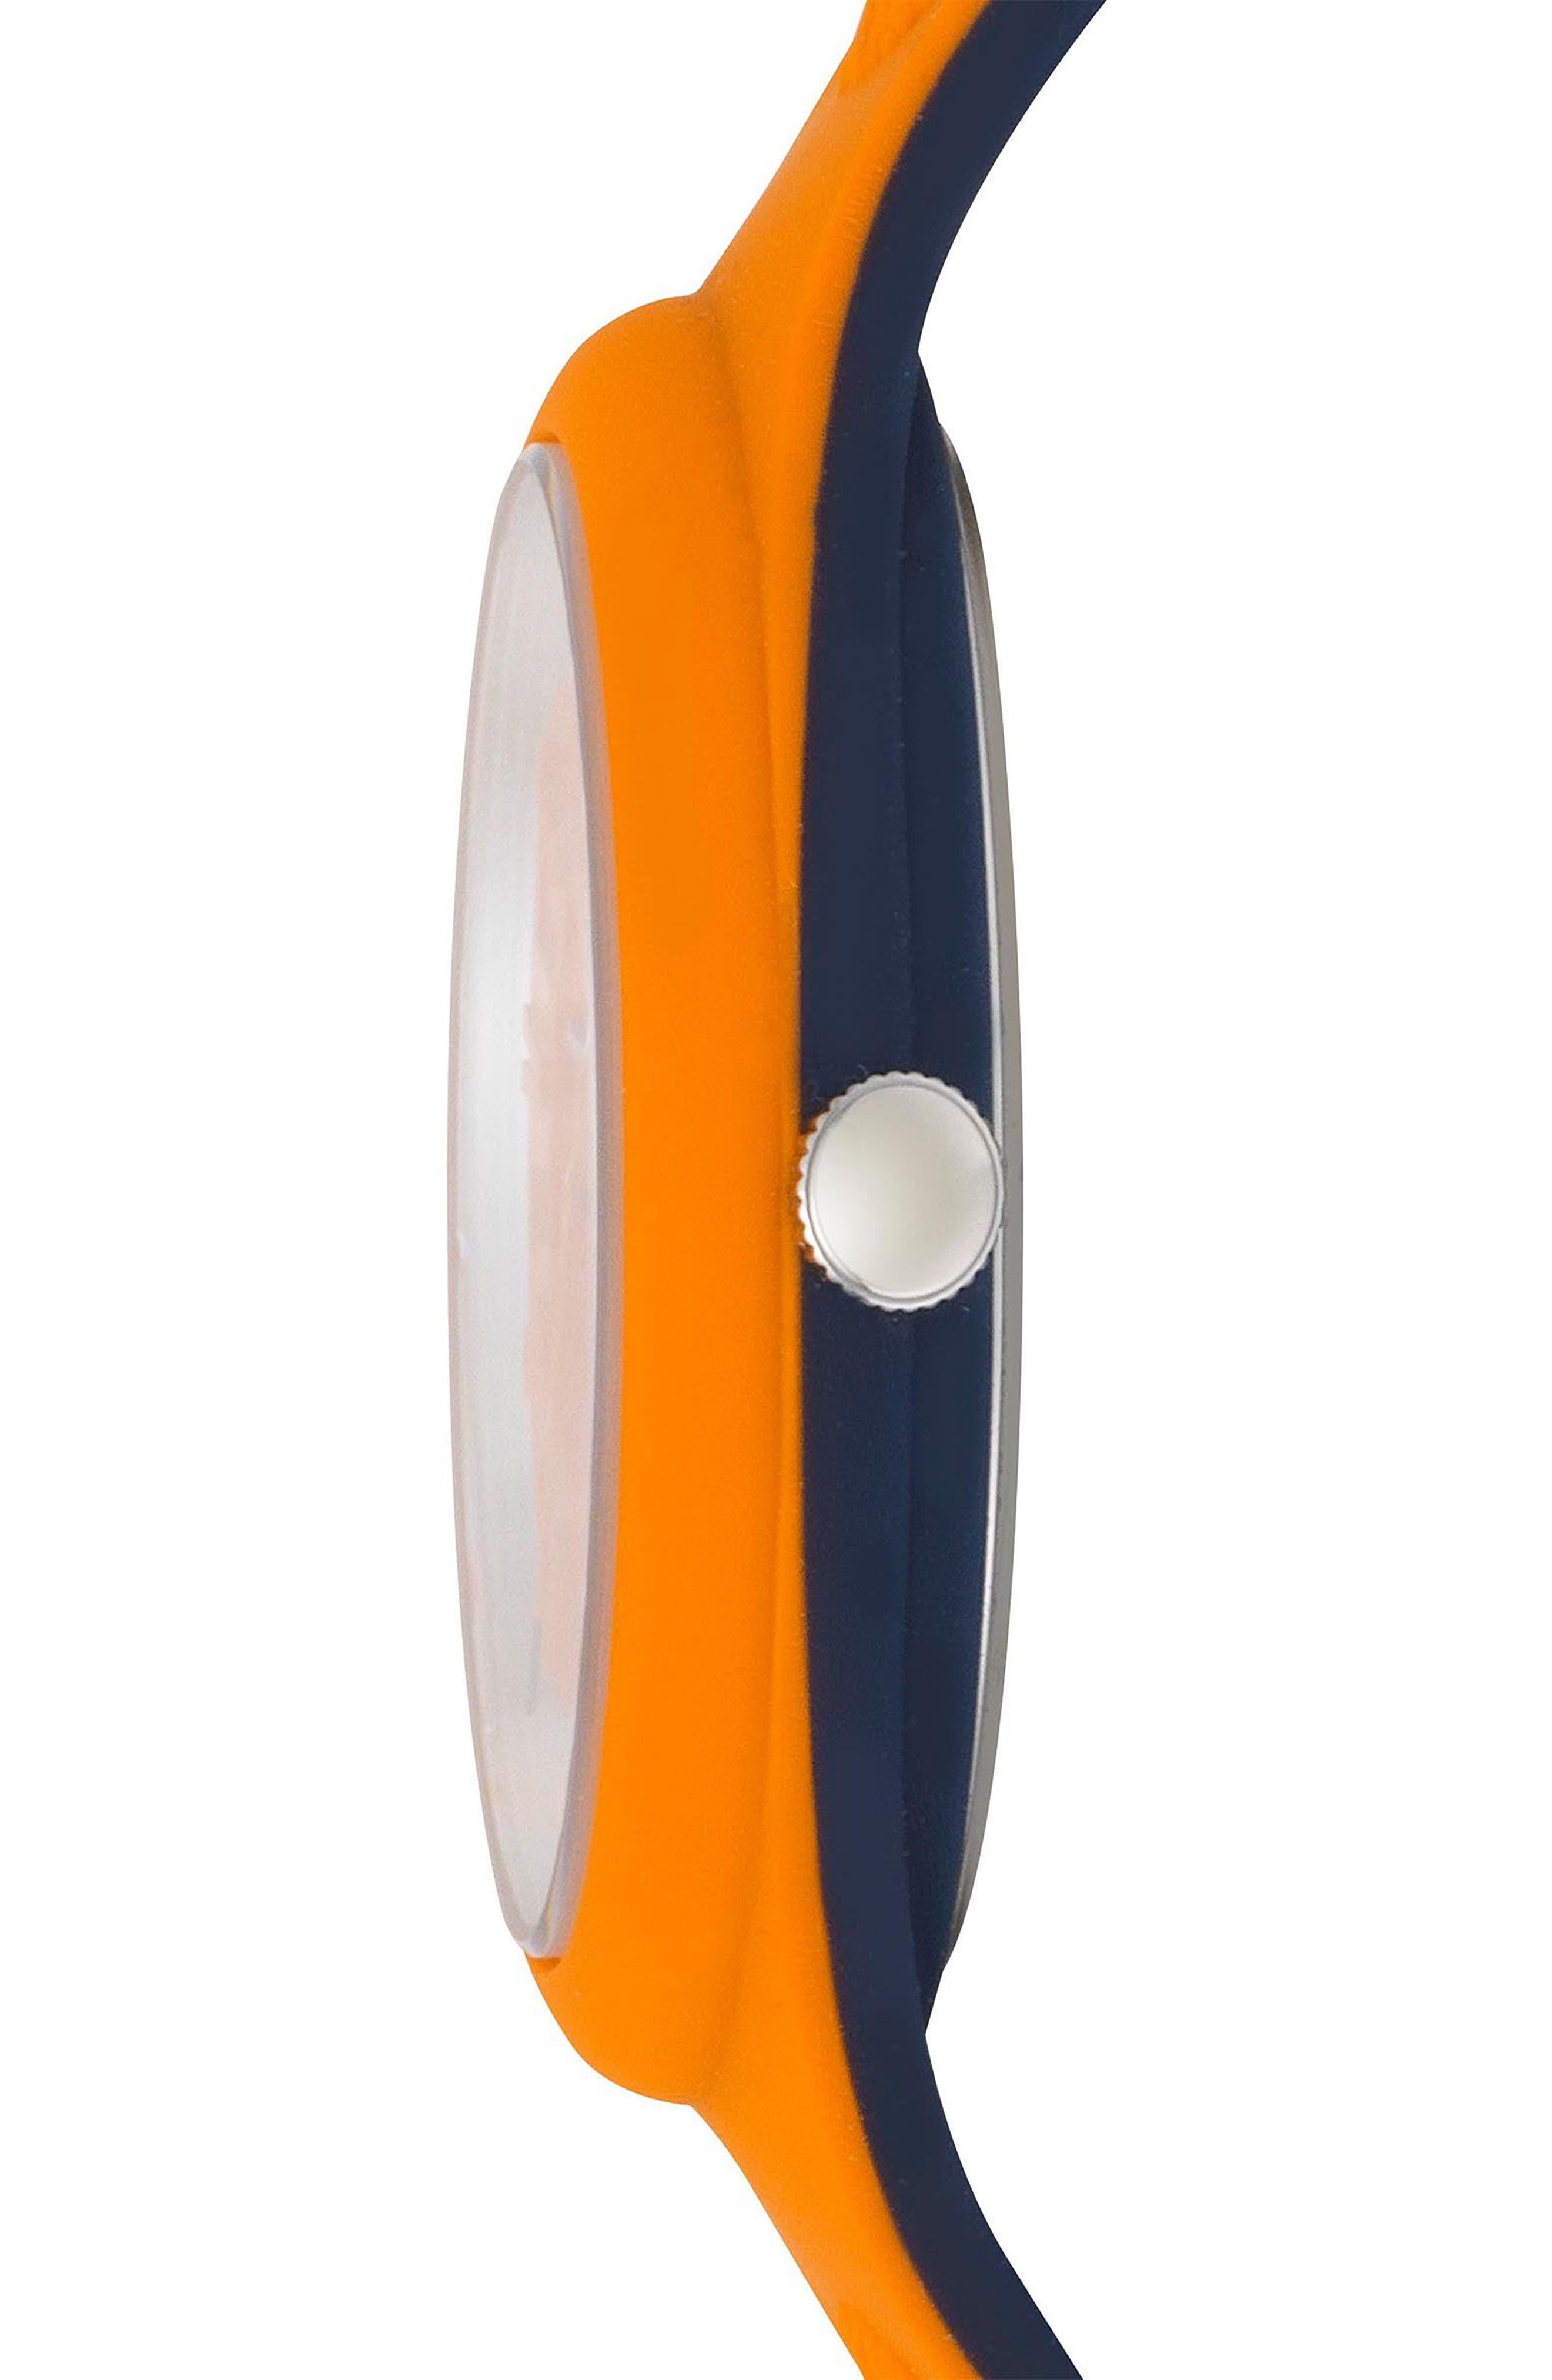 VERSUS VERSACE, Fire Island Silicone Strap Watch, 39mm, Alternate thumbnail 2, color, ORANGE/ GREY